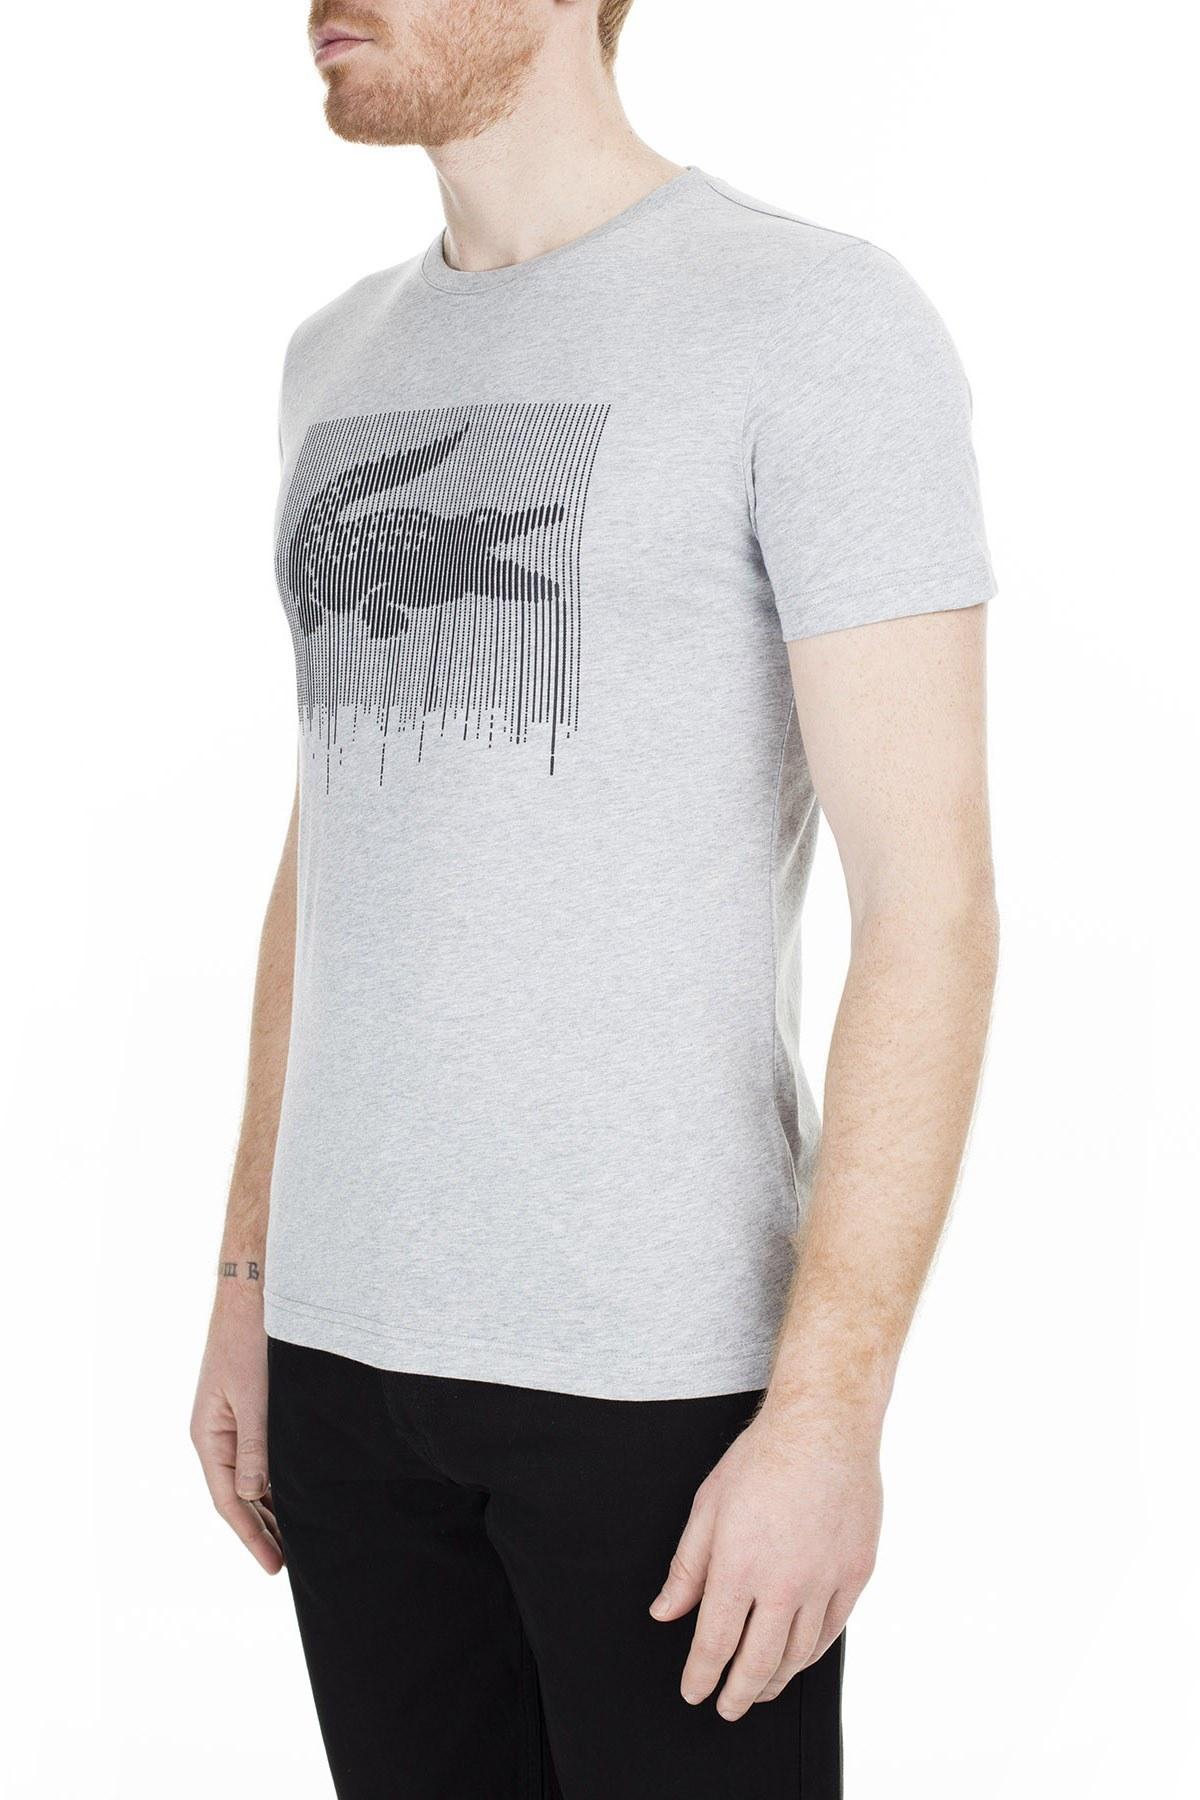 Lacoste Erkek T Shirt TH0013 13G GRİ